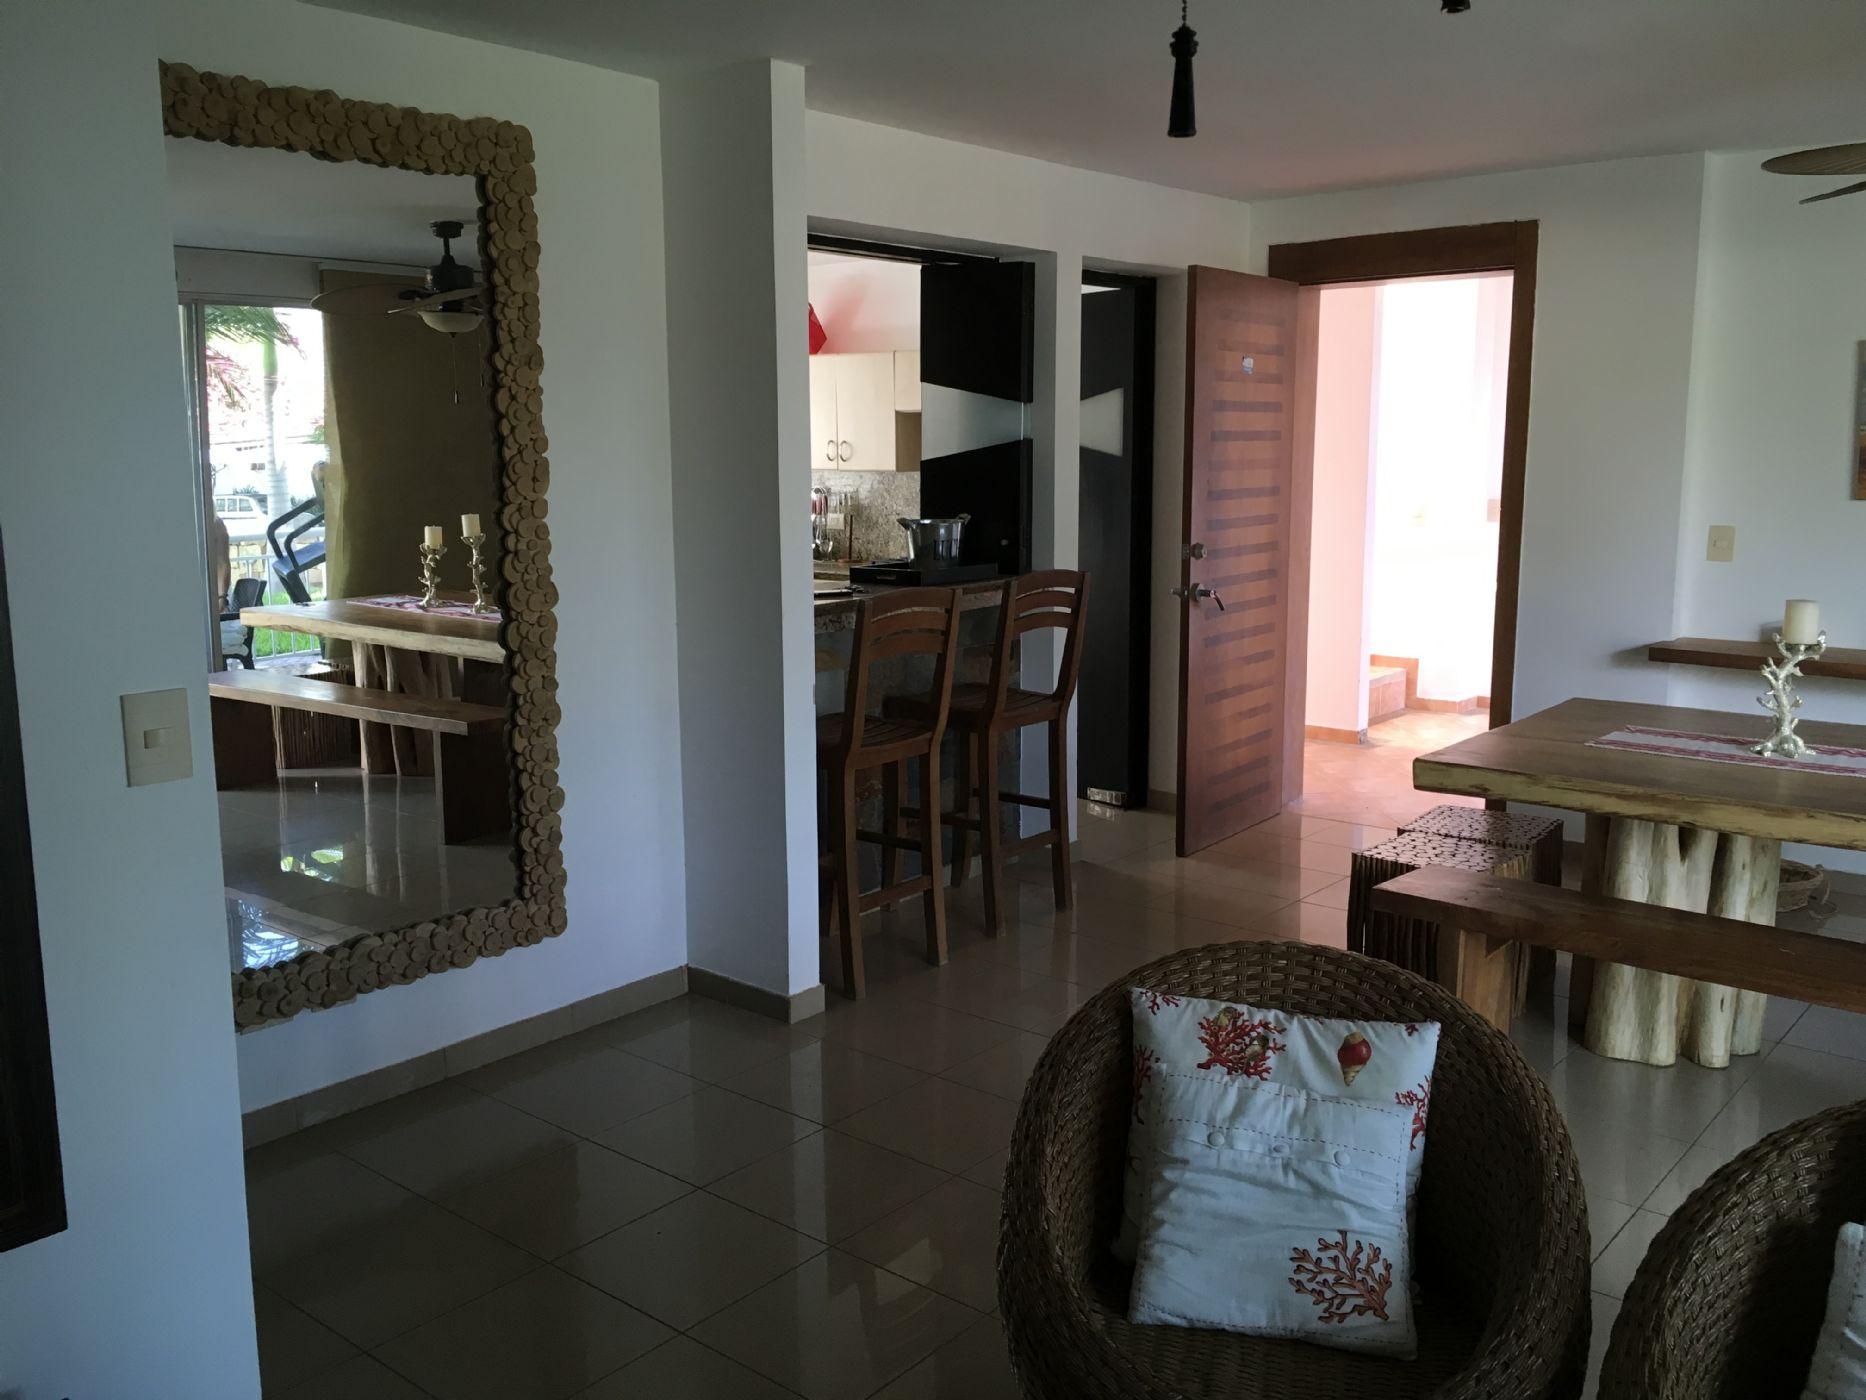 Punta-Blanca-Ecuador-property-505190-7.JPG